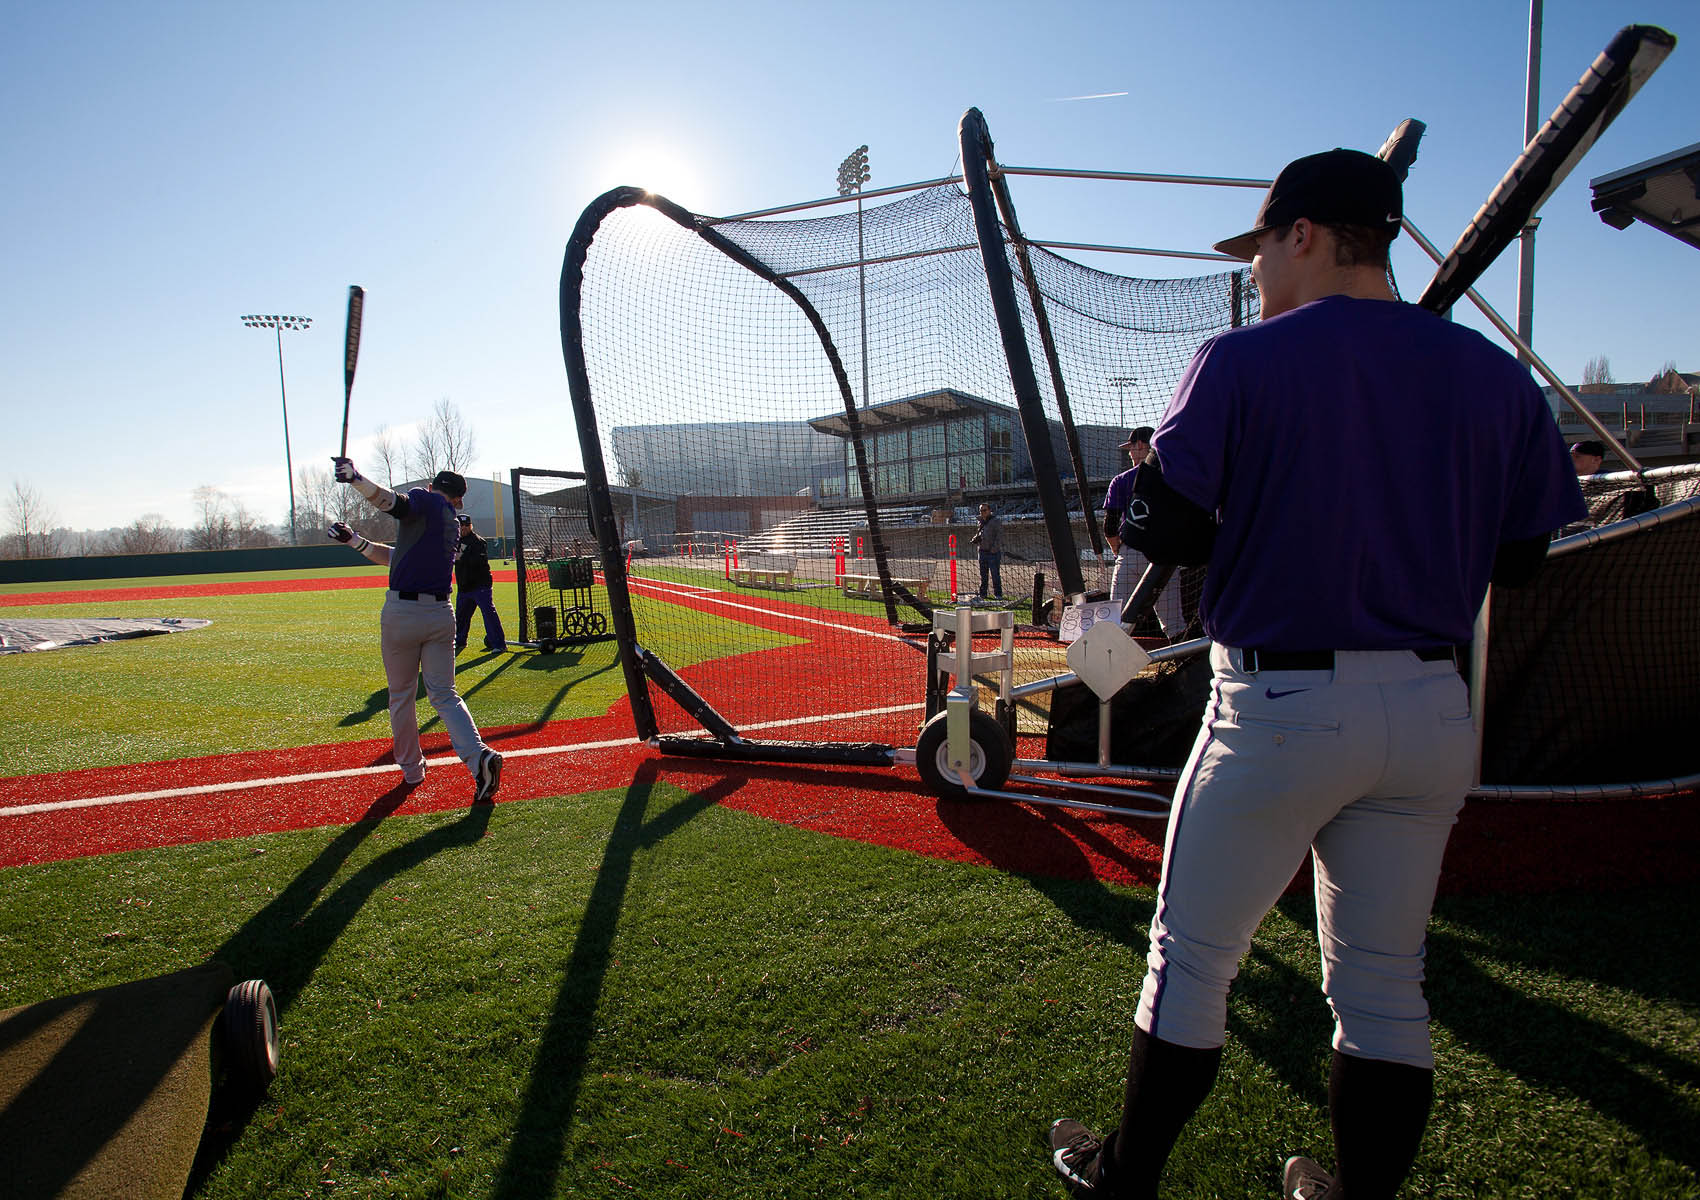 UW_Baseball_Stadium